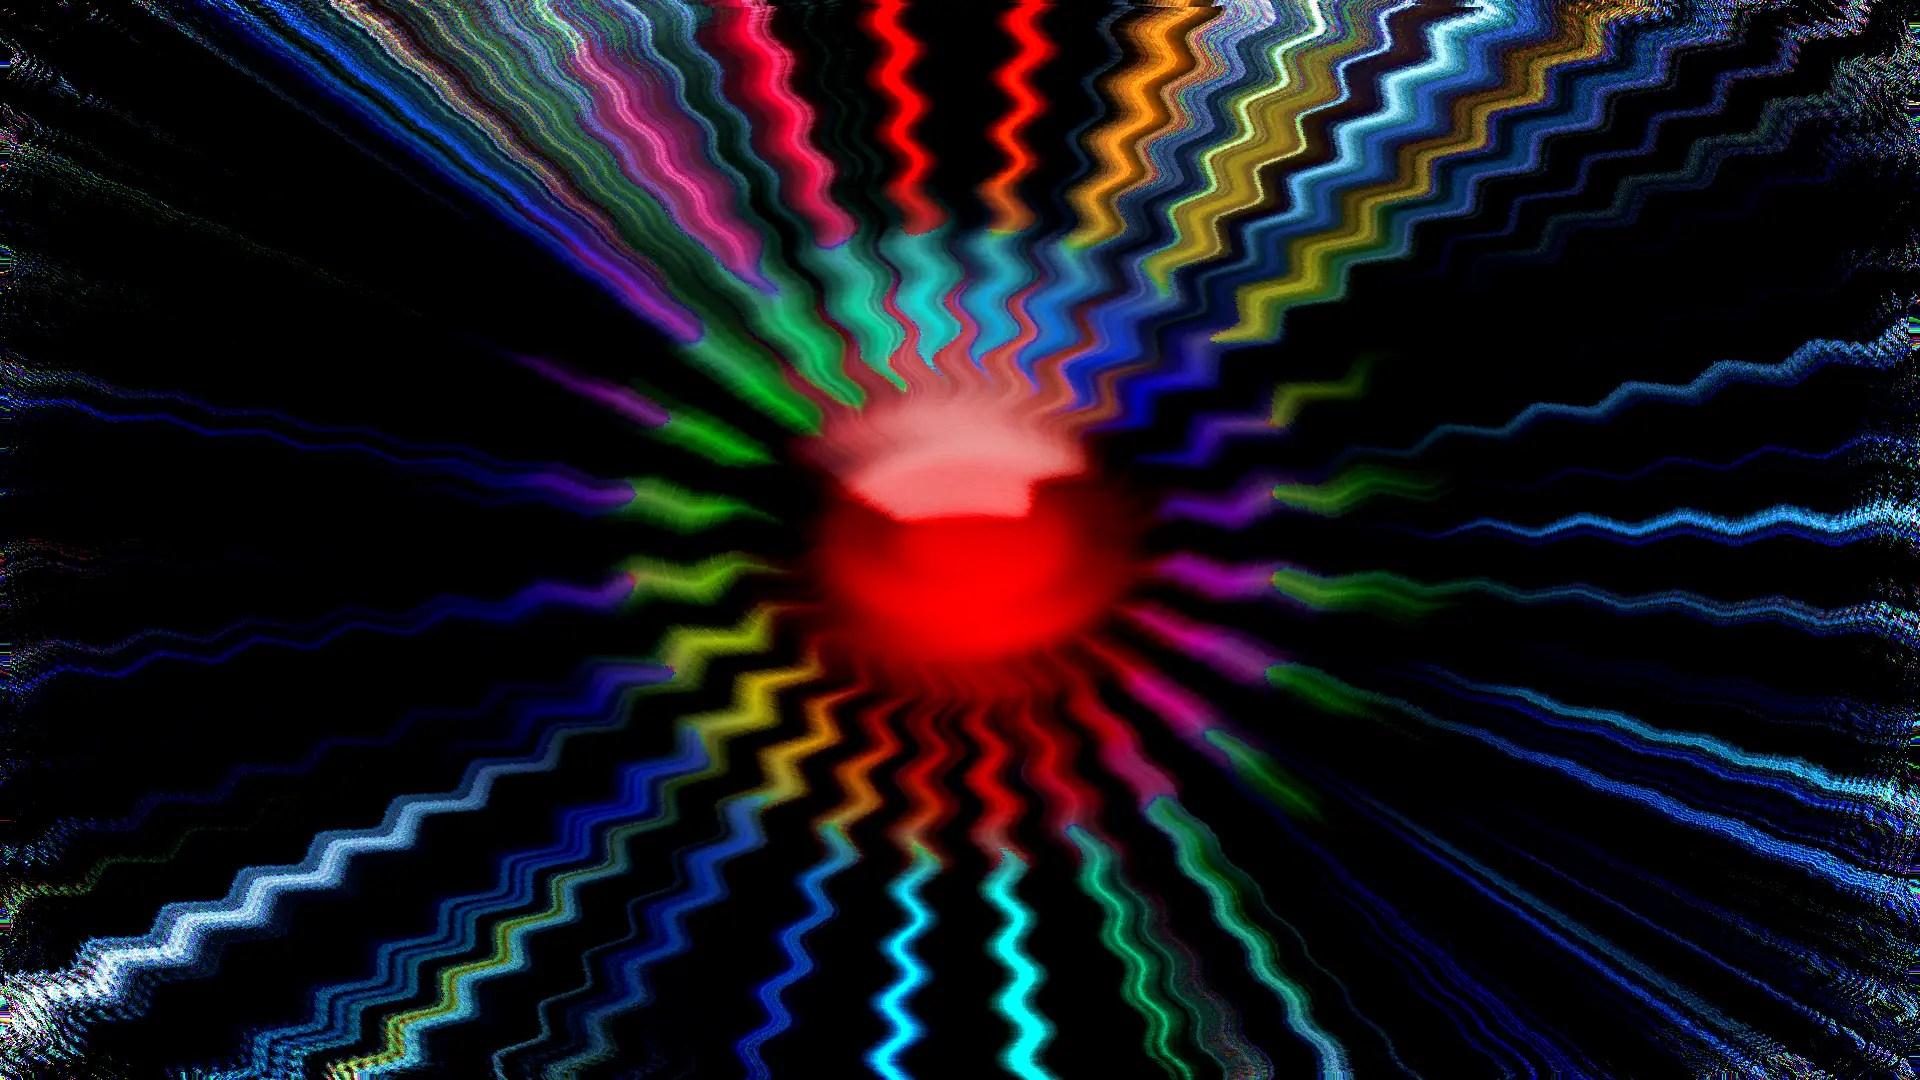 HD Cool Trippy Wallpaper